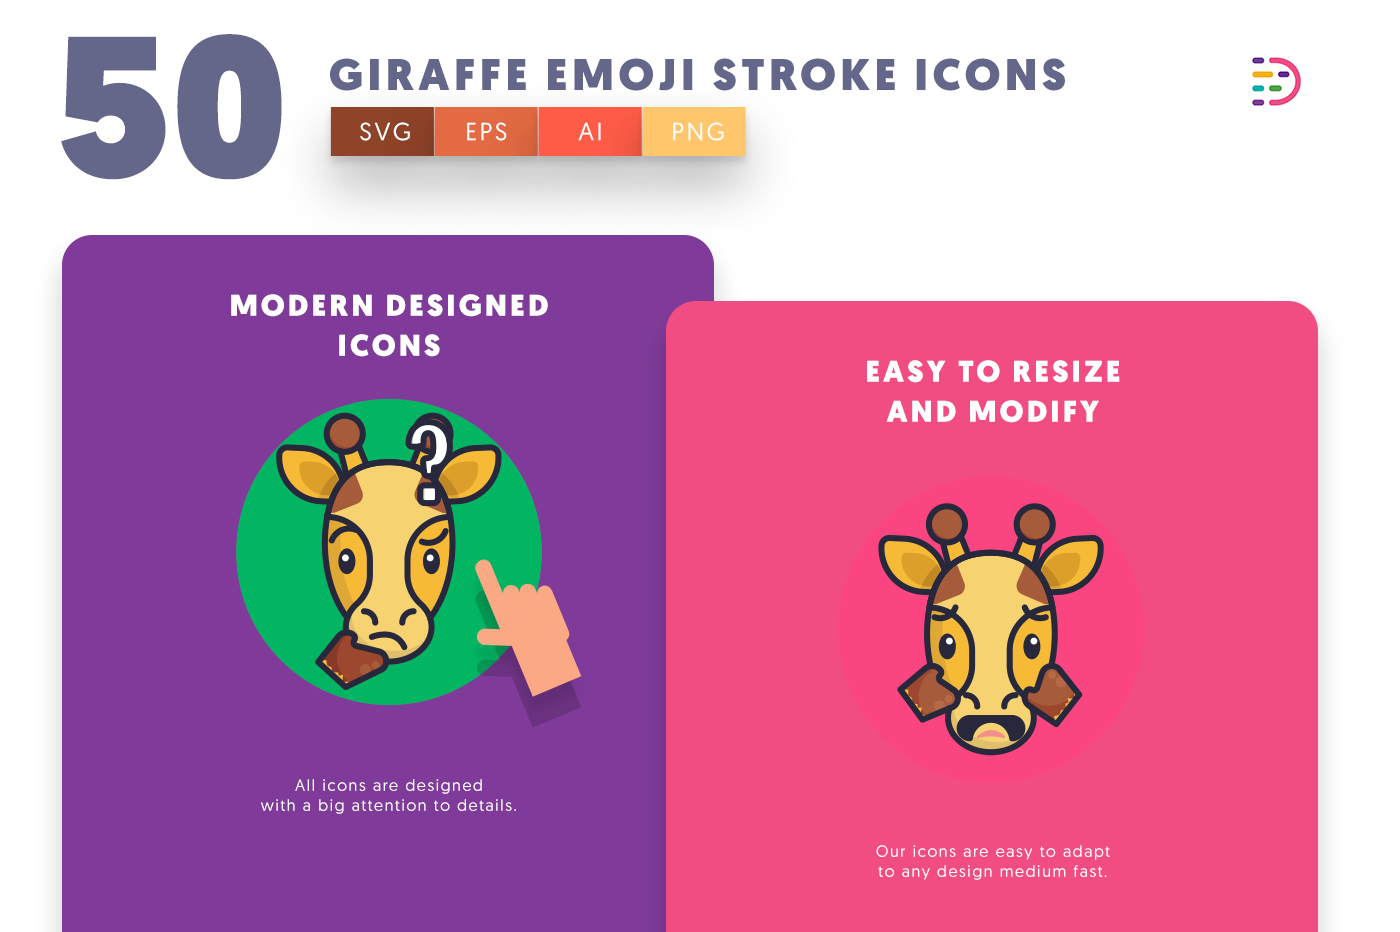 Giraffe Emoji Stroke icons png/svg/eps